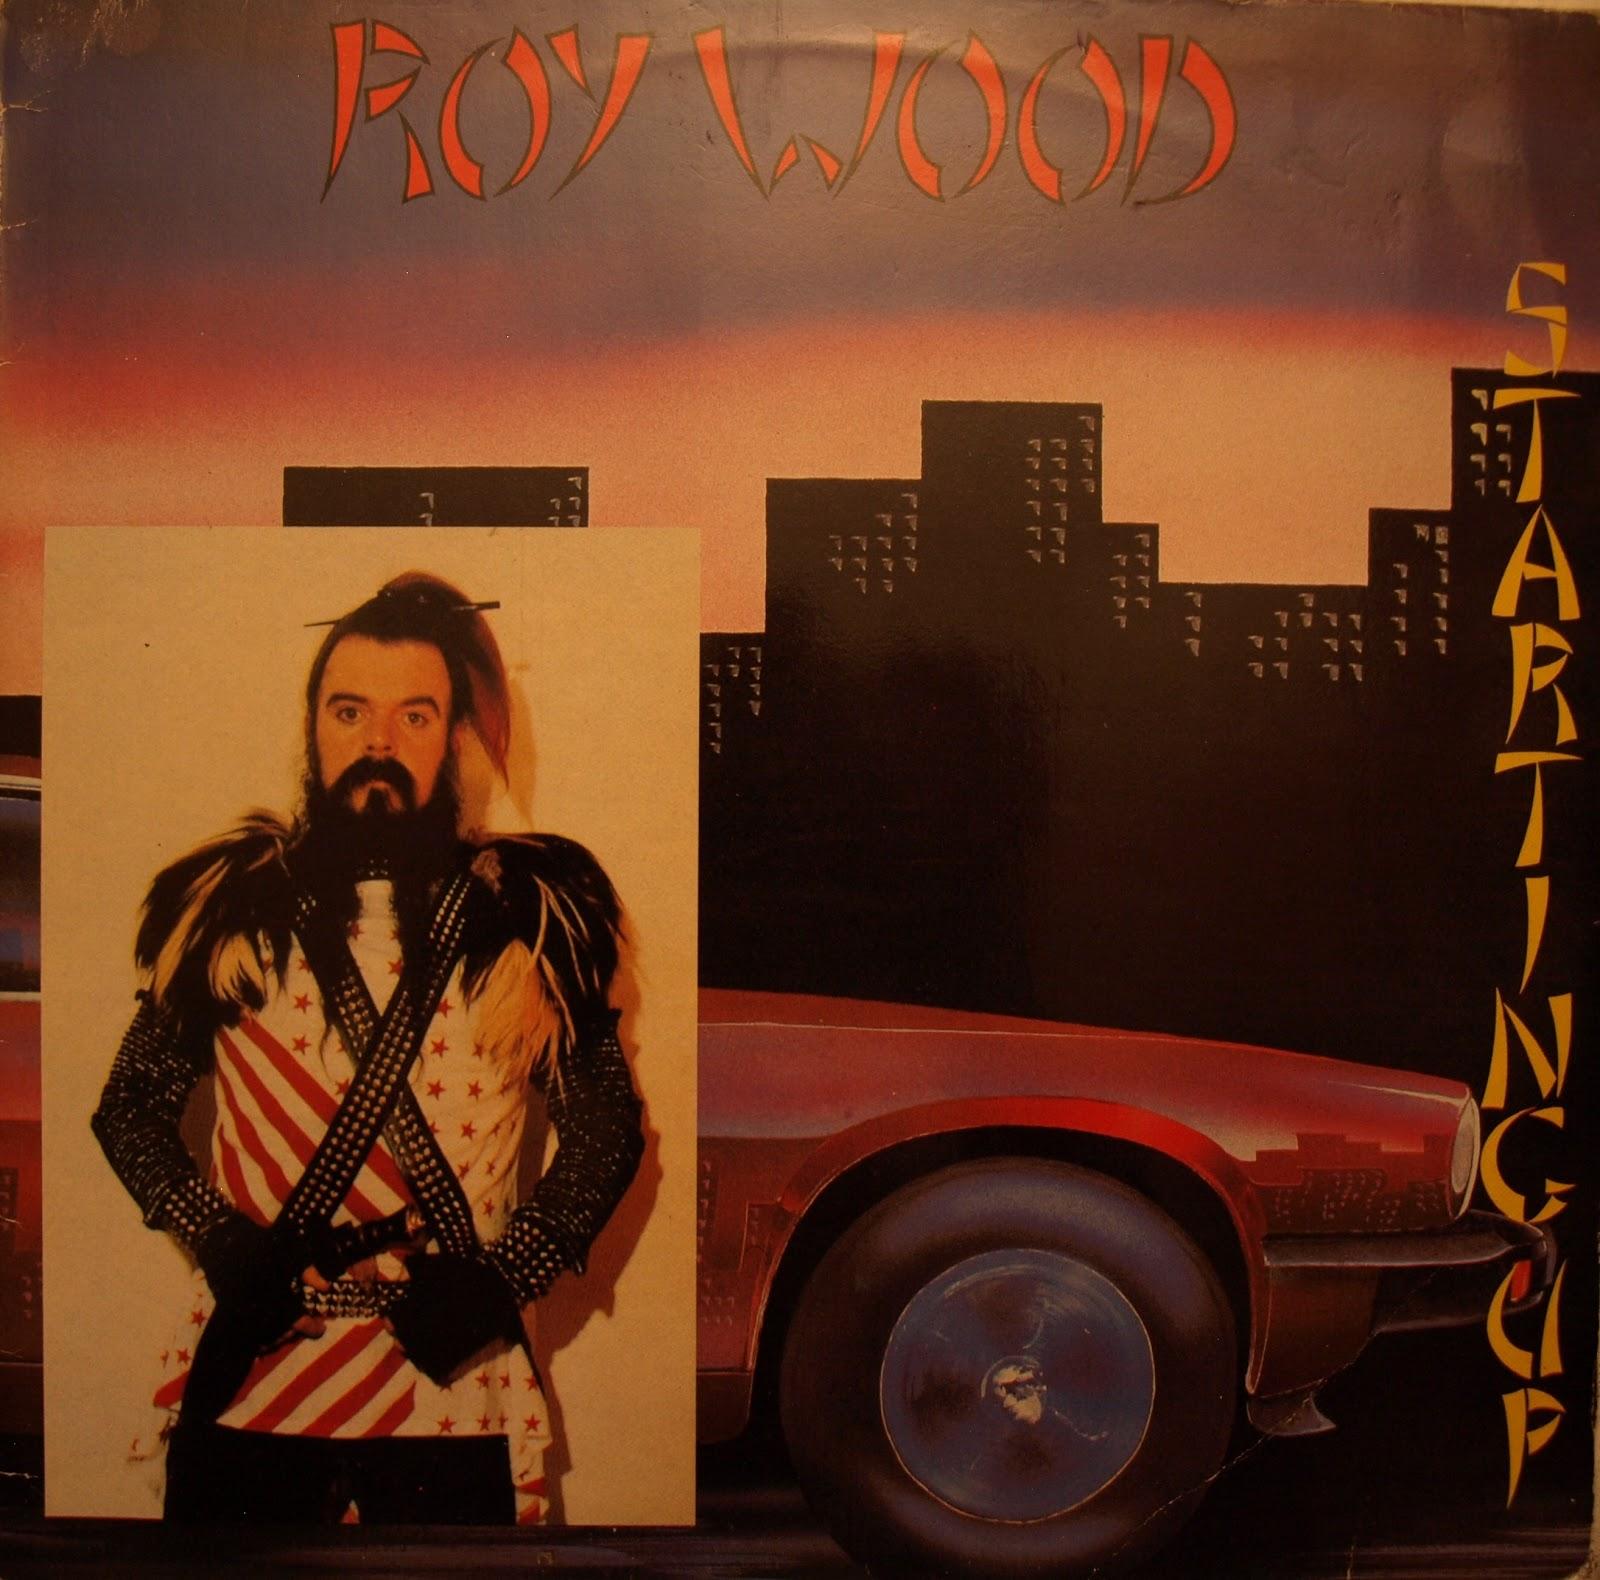 ELO Related Vinyl  Roy Wood - Starting Up - Lp - España f3e9f7c2b18